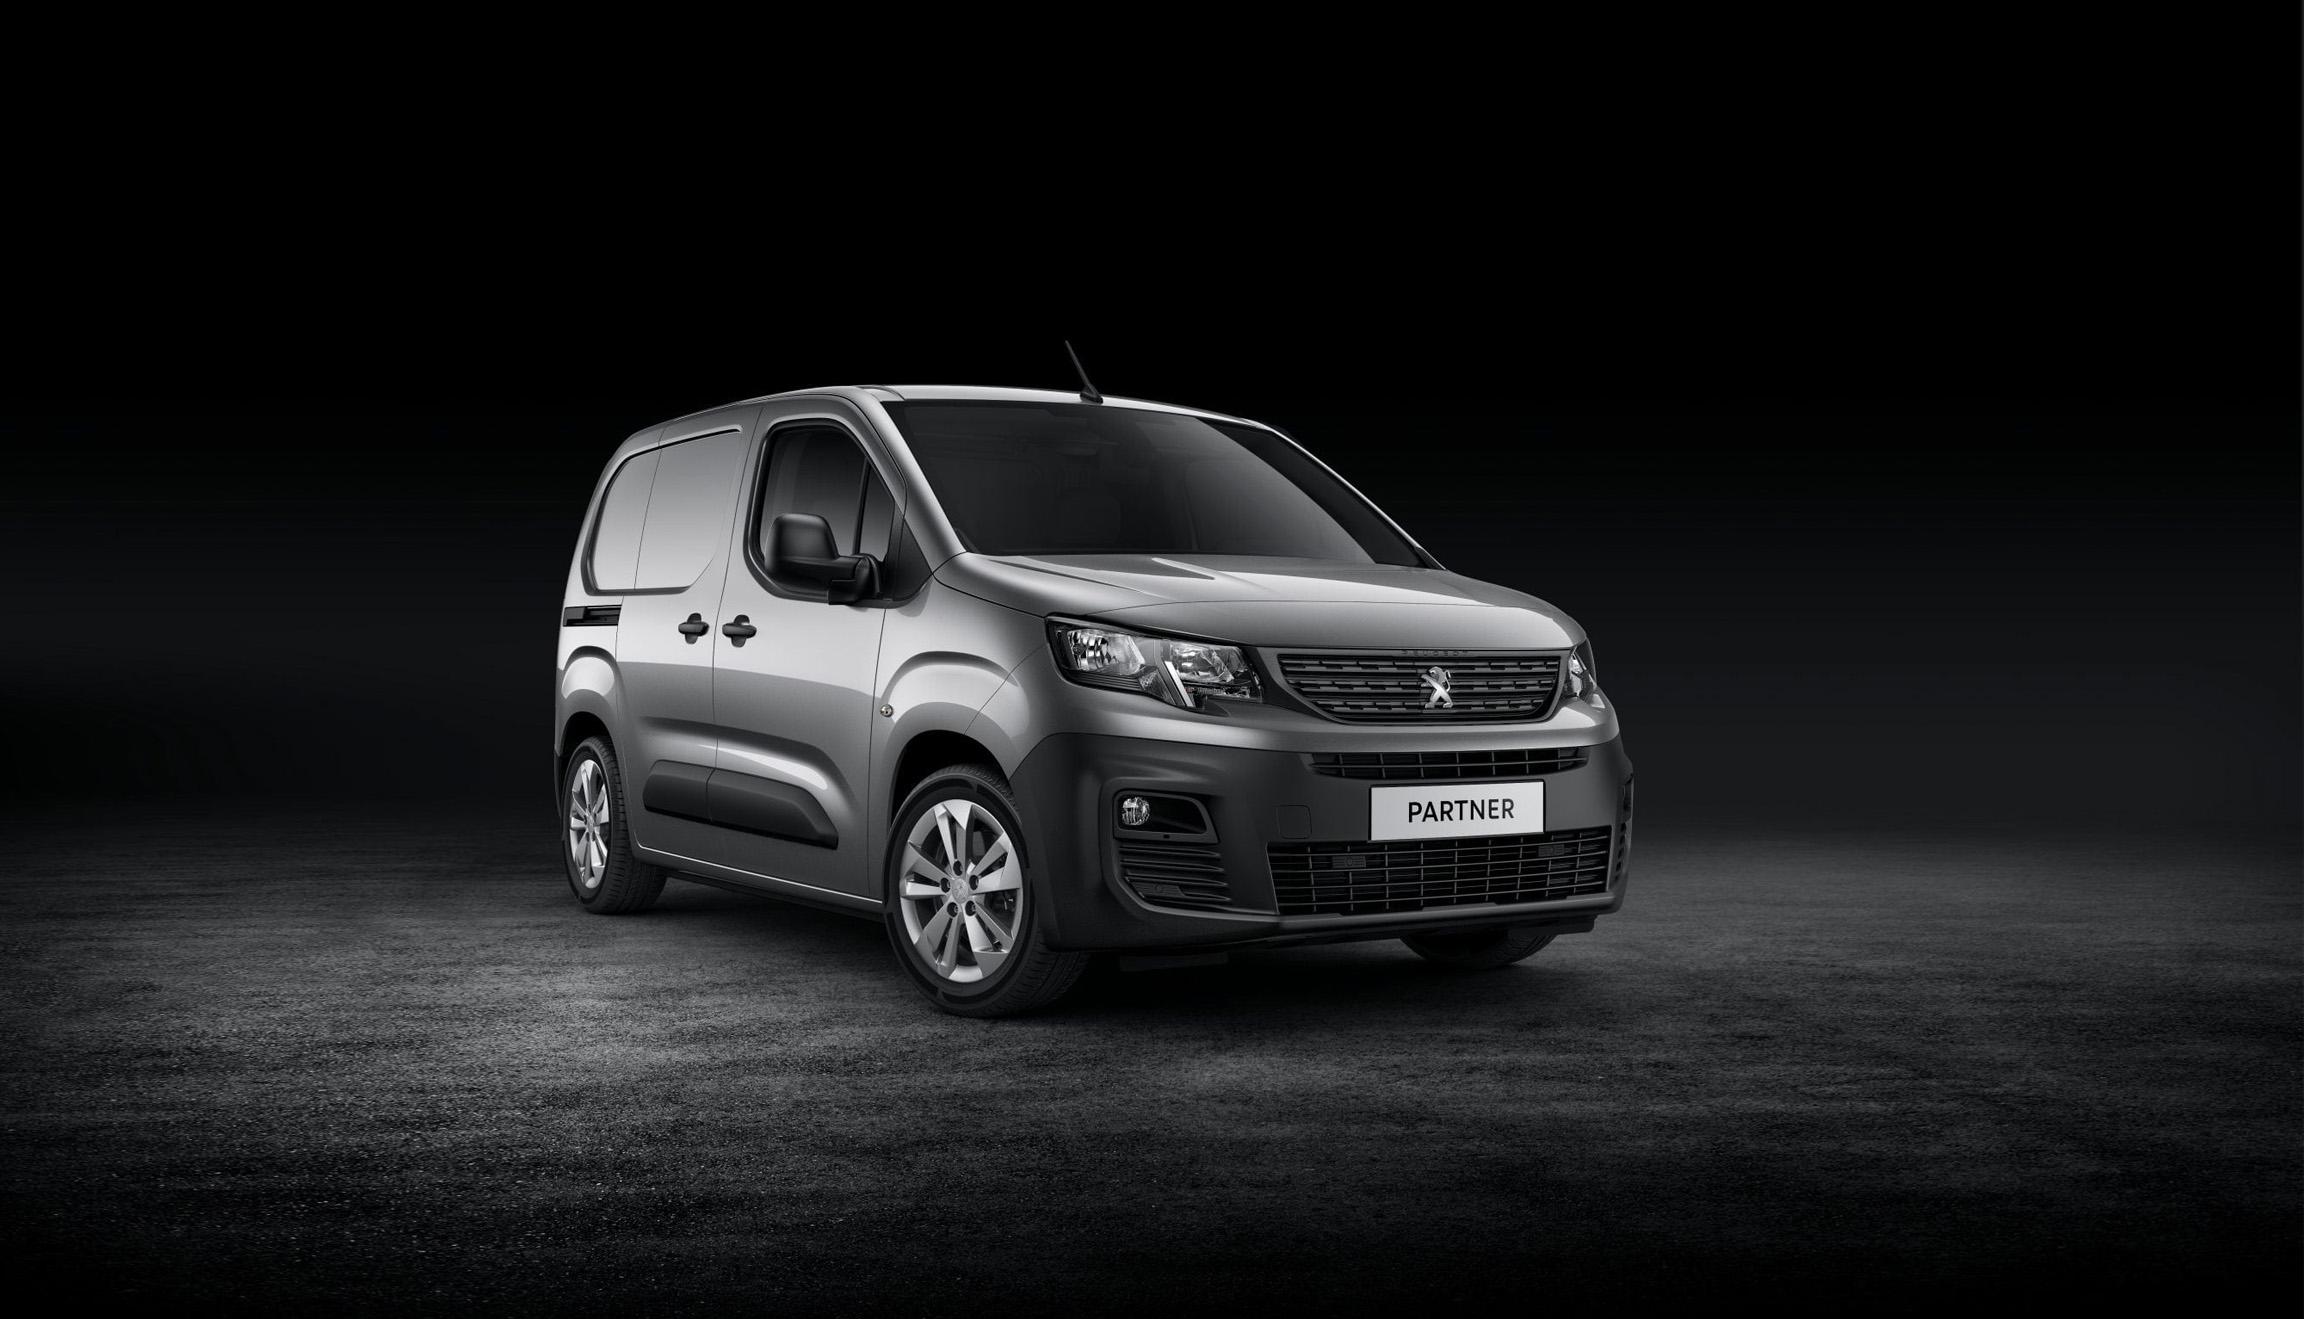 Rij-impressie Peugeot Partner